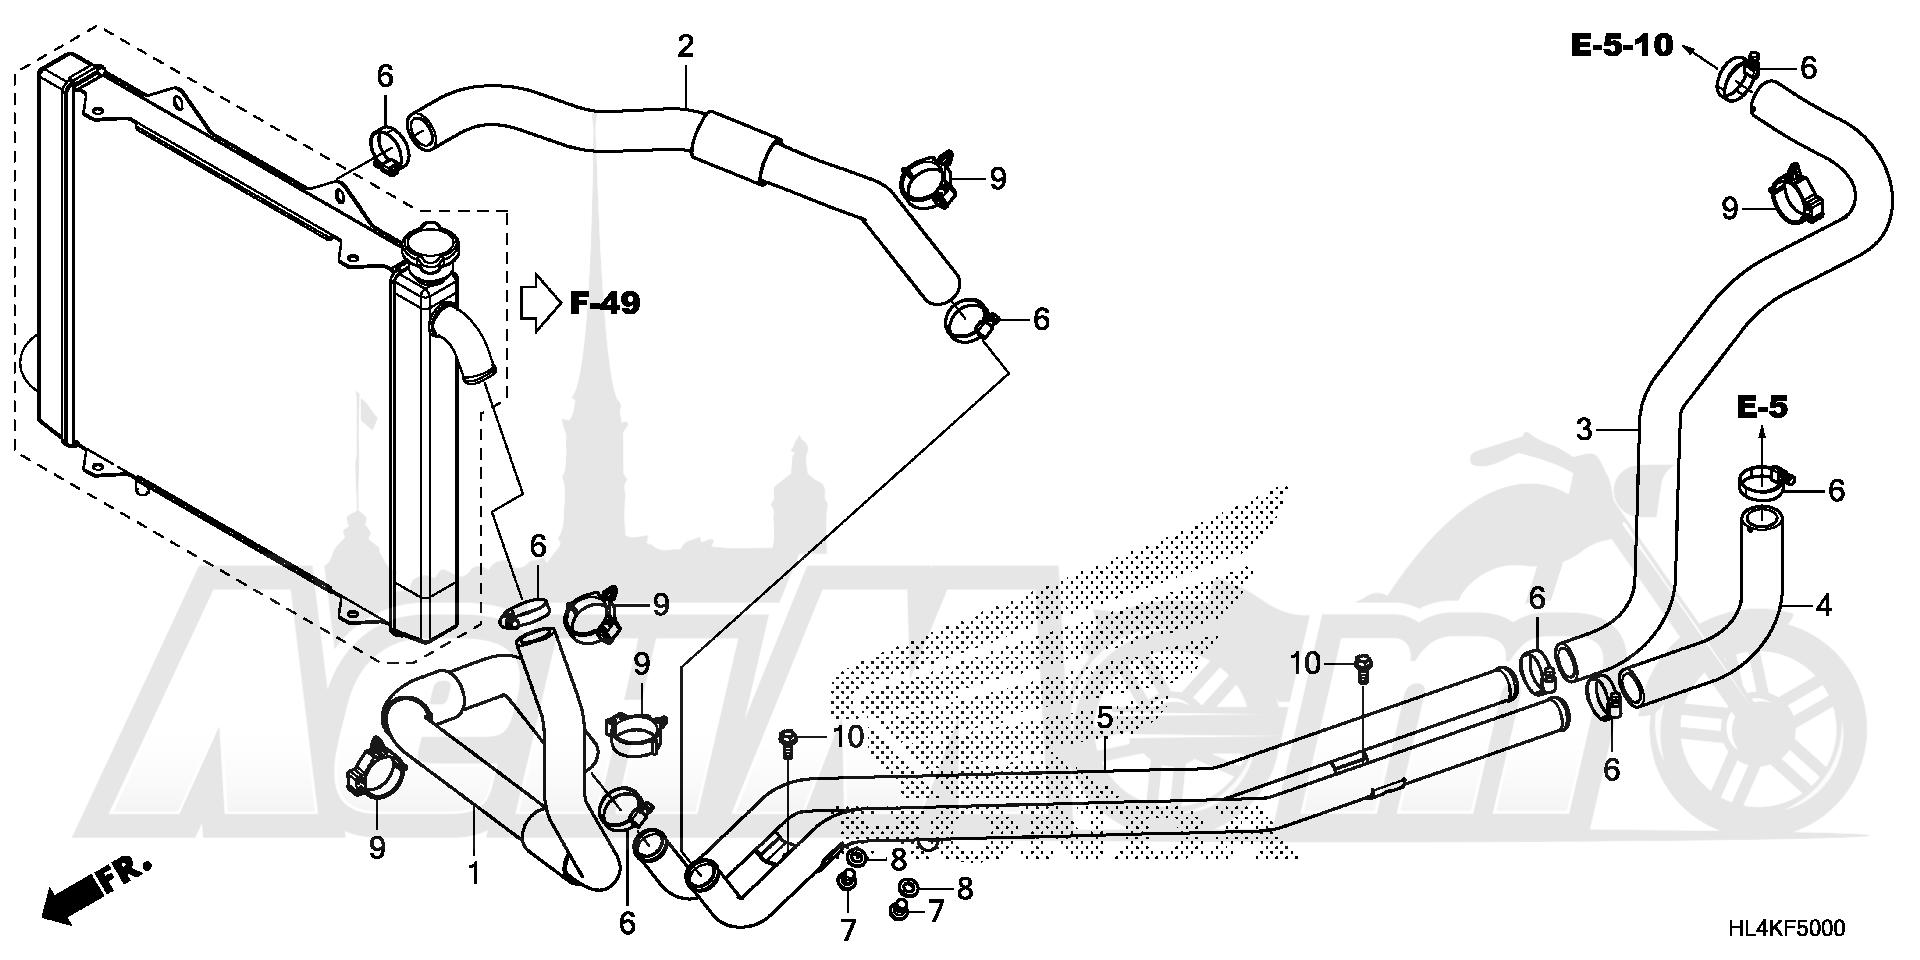 Запчасти для Квадроцикла Honda 2019 SXS1000M3P Раздел: WATER PIPE AND WATER HOSE | вода труба и вода шланг